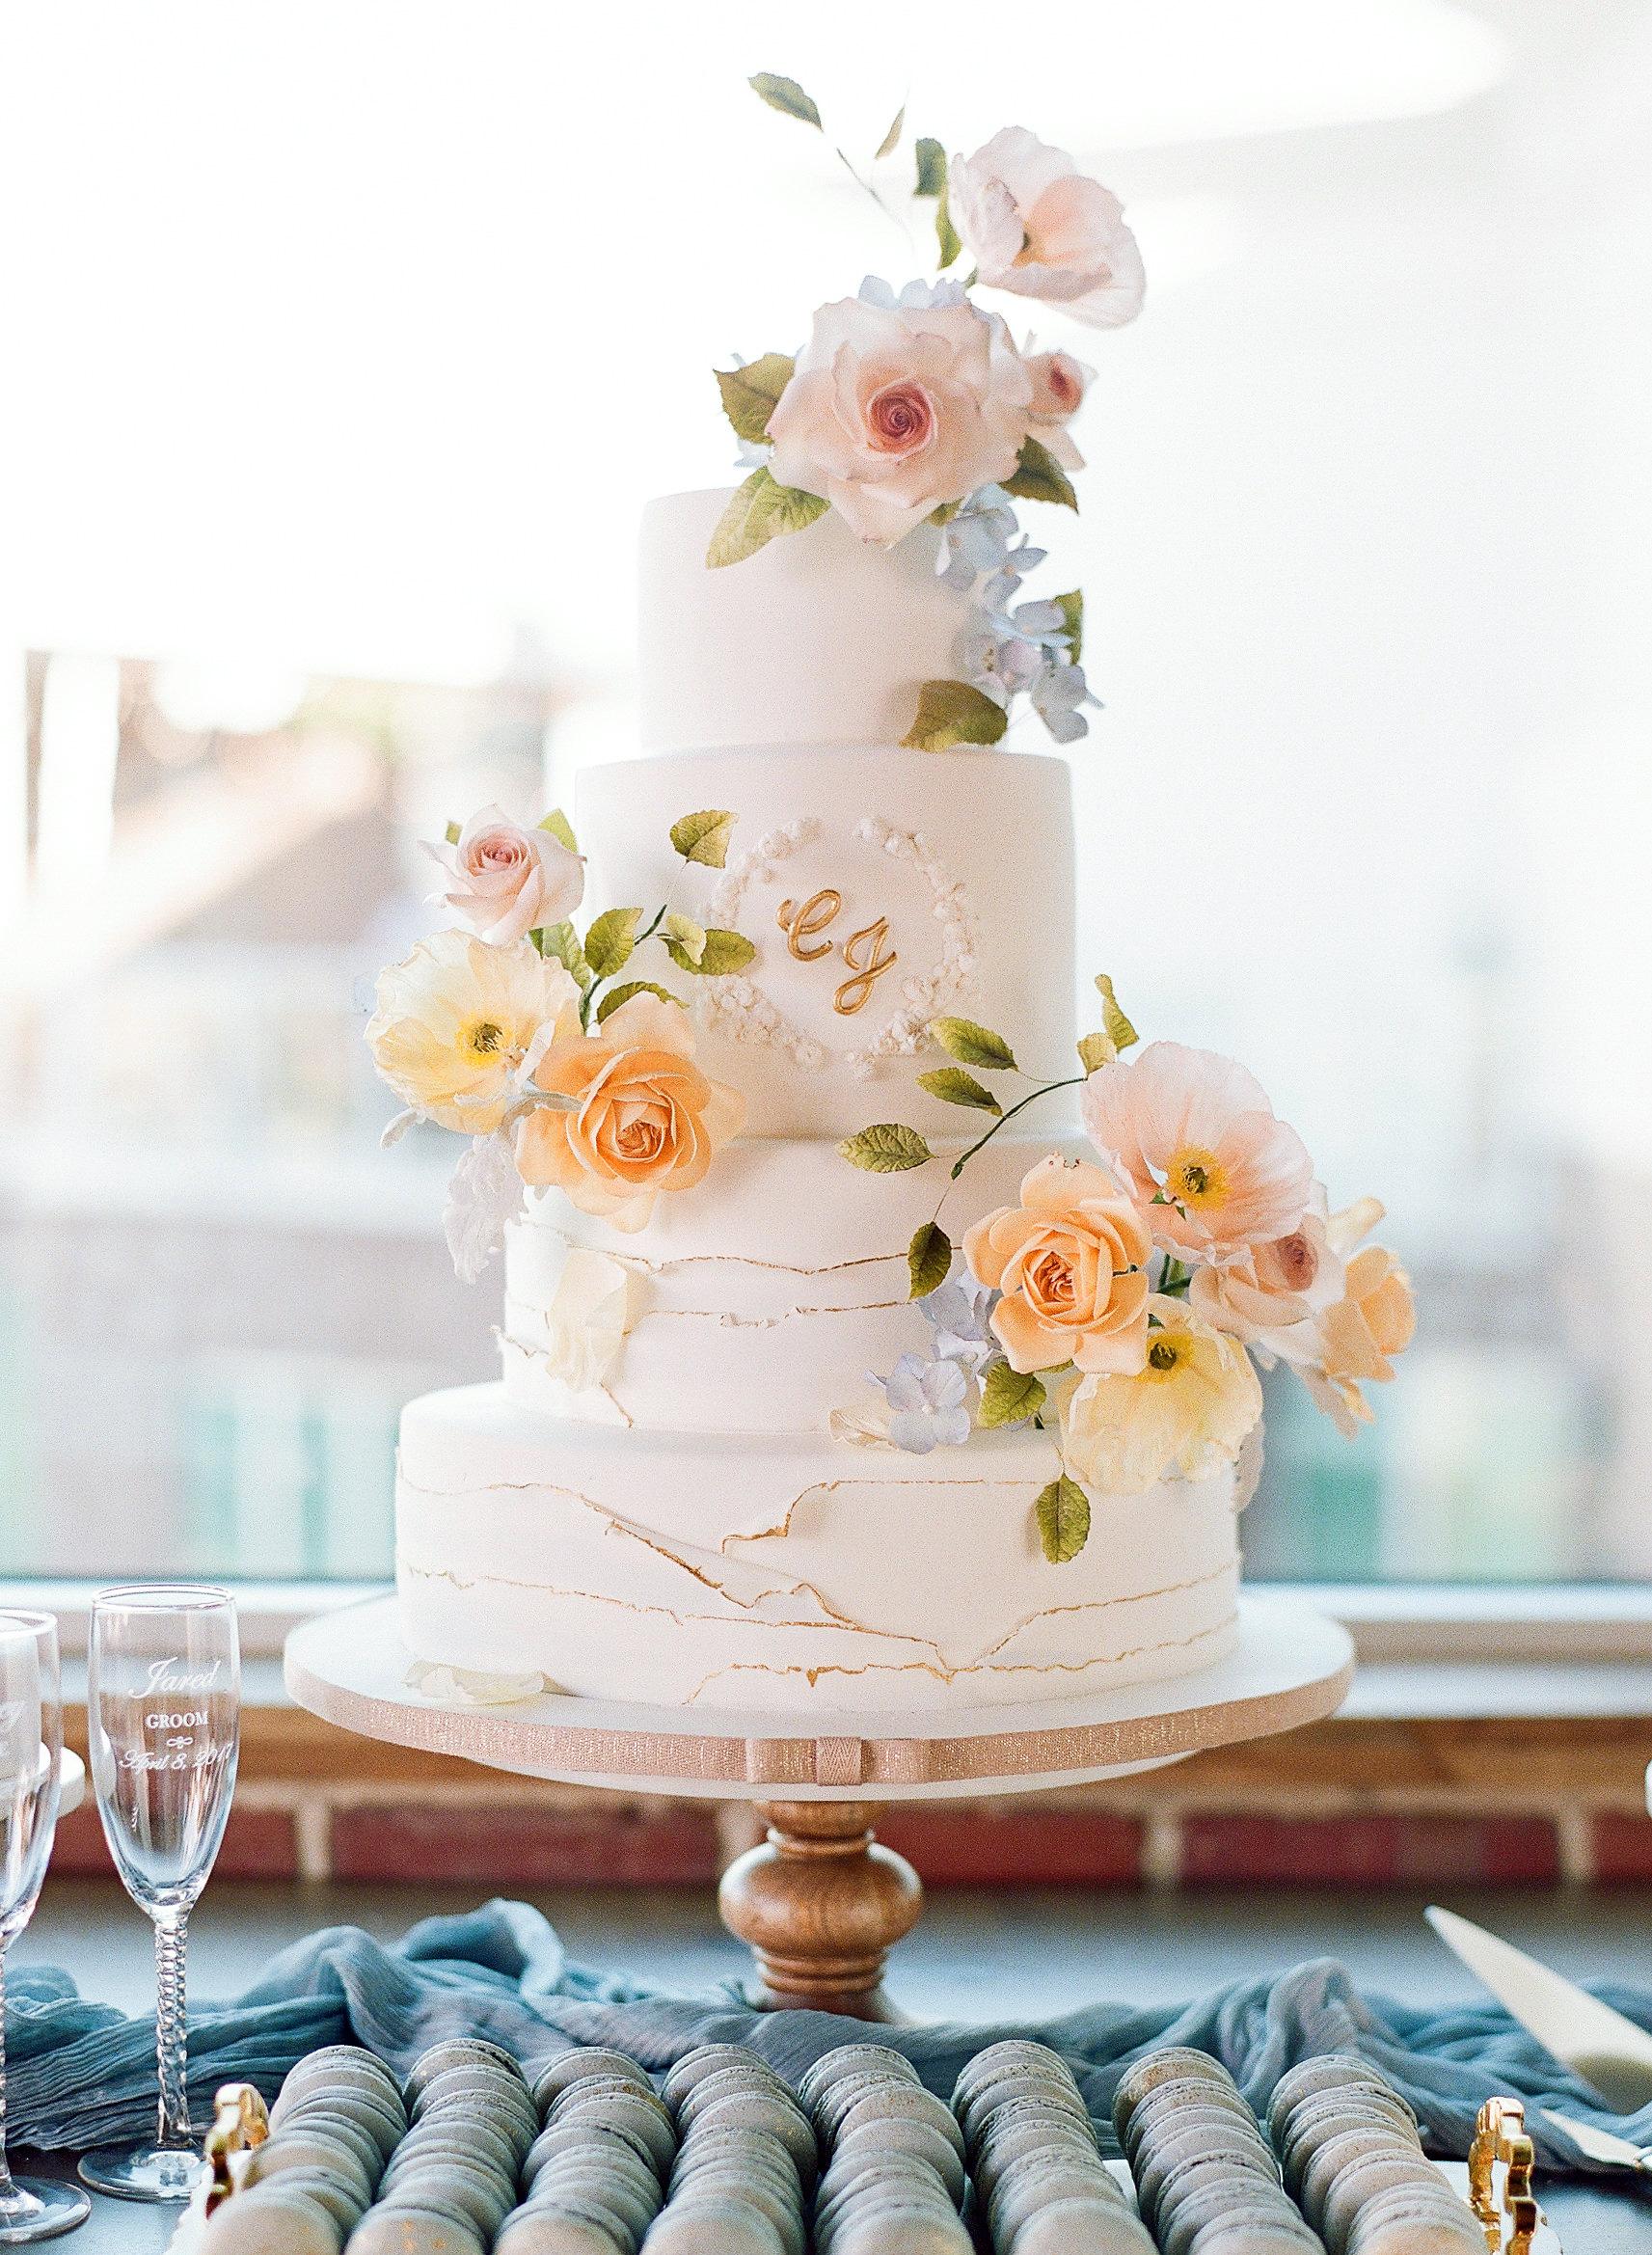 A Convincing Cake